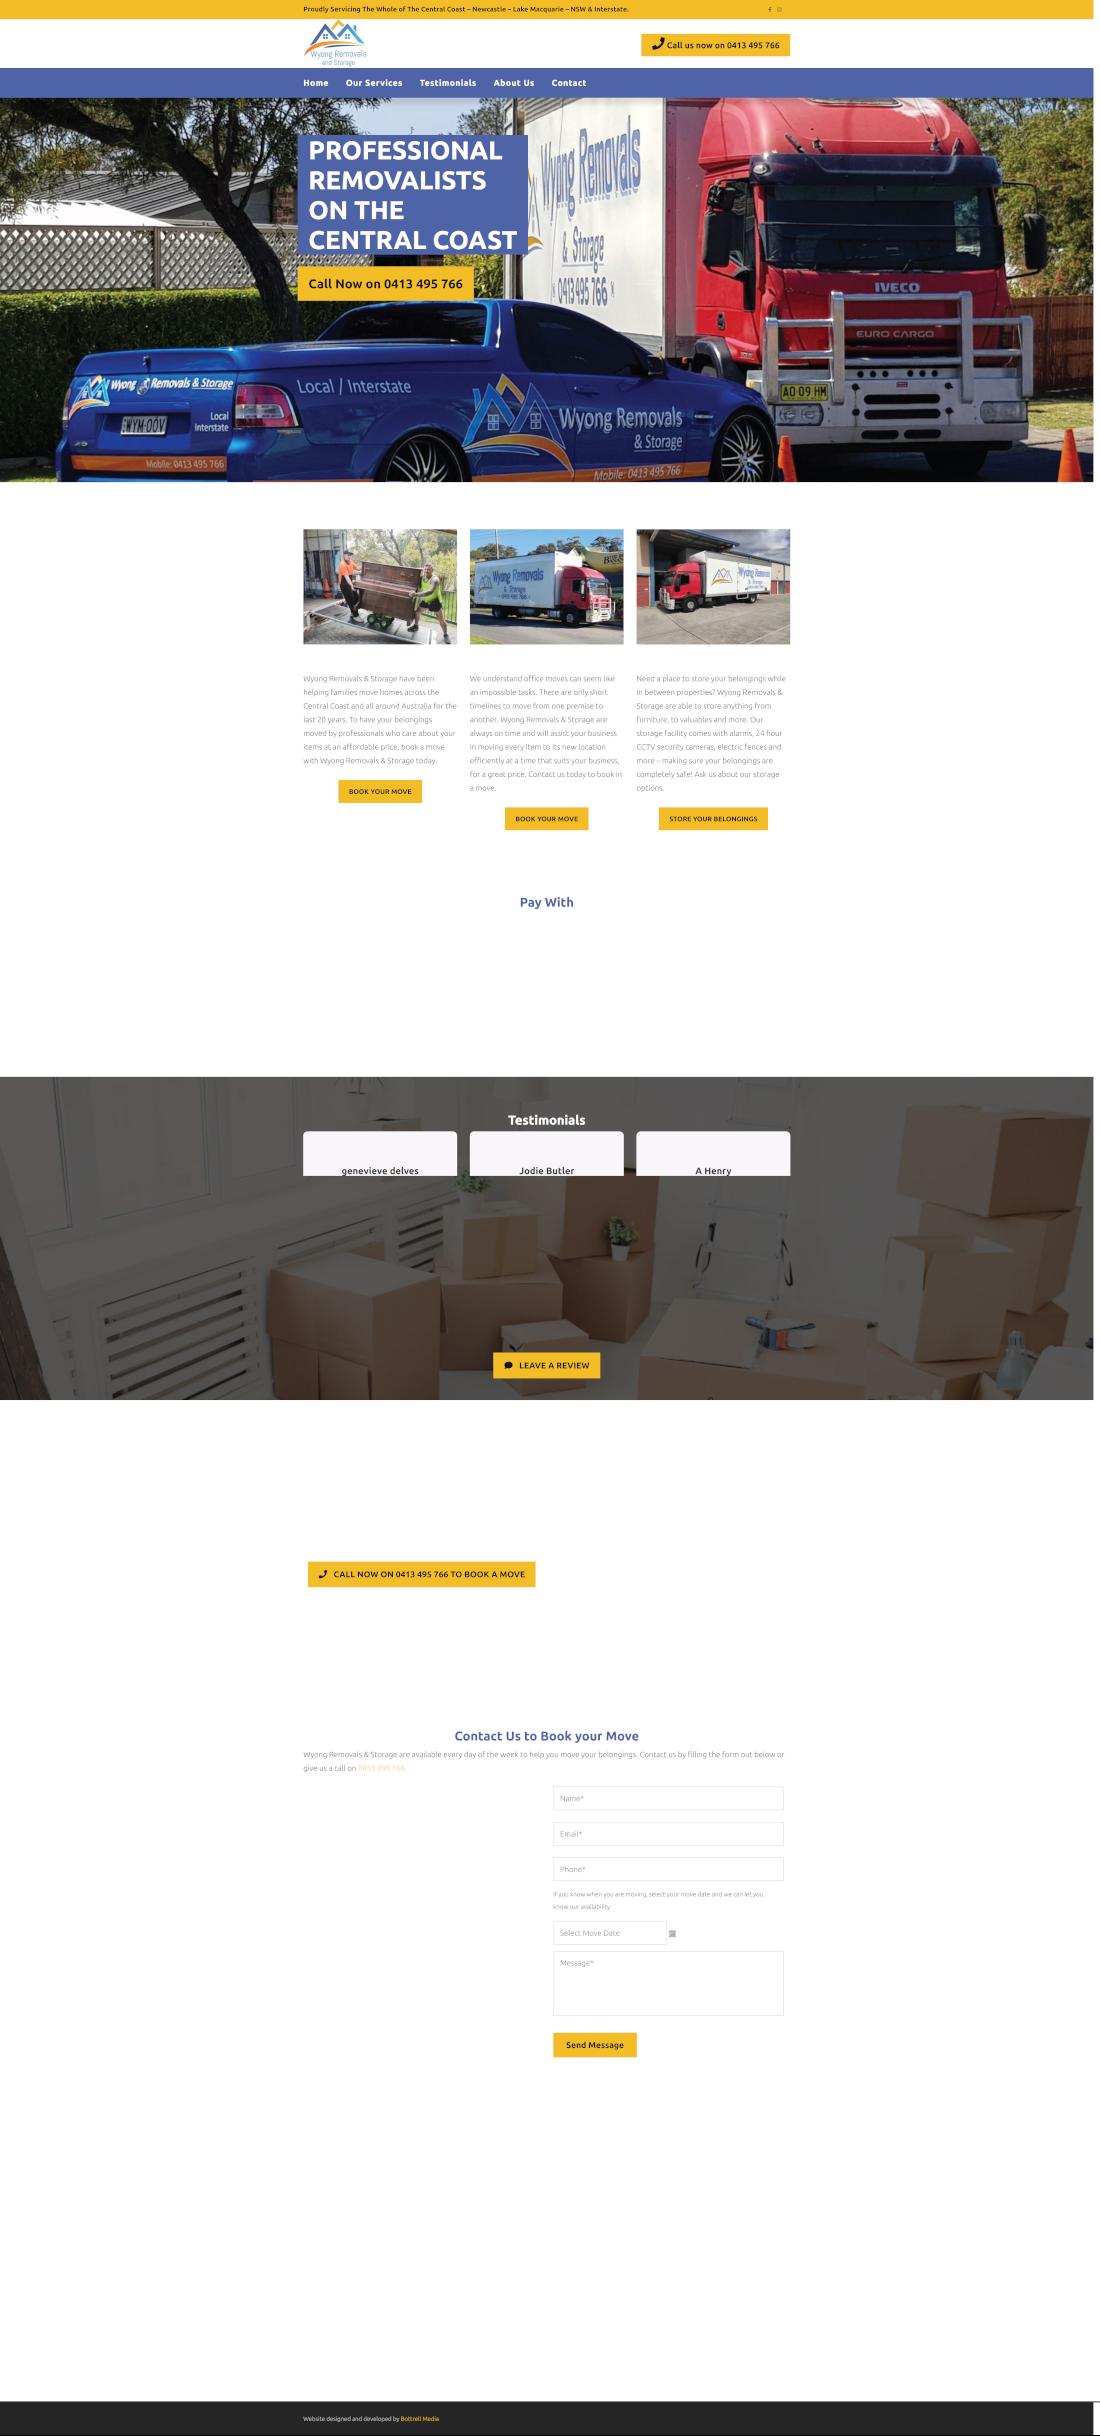 wyongremovalsandstorage full homepage